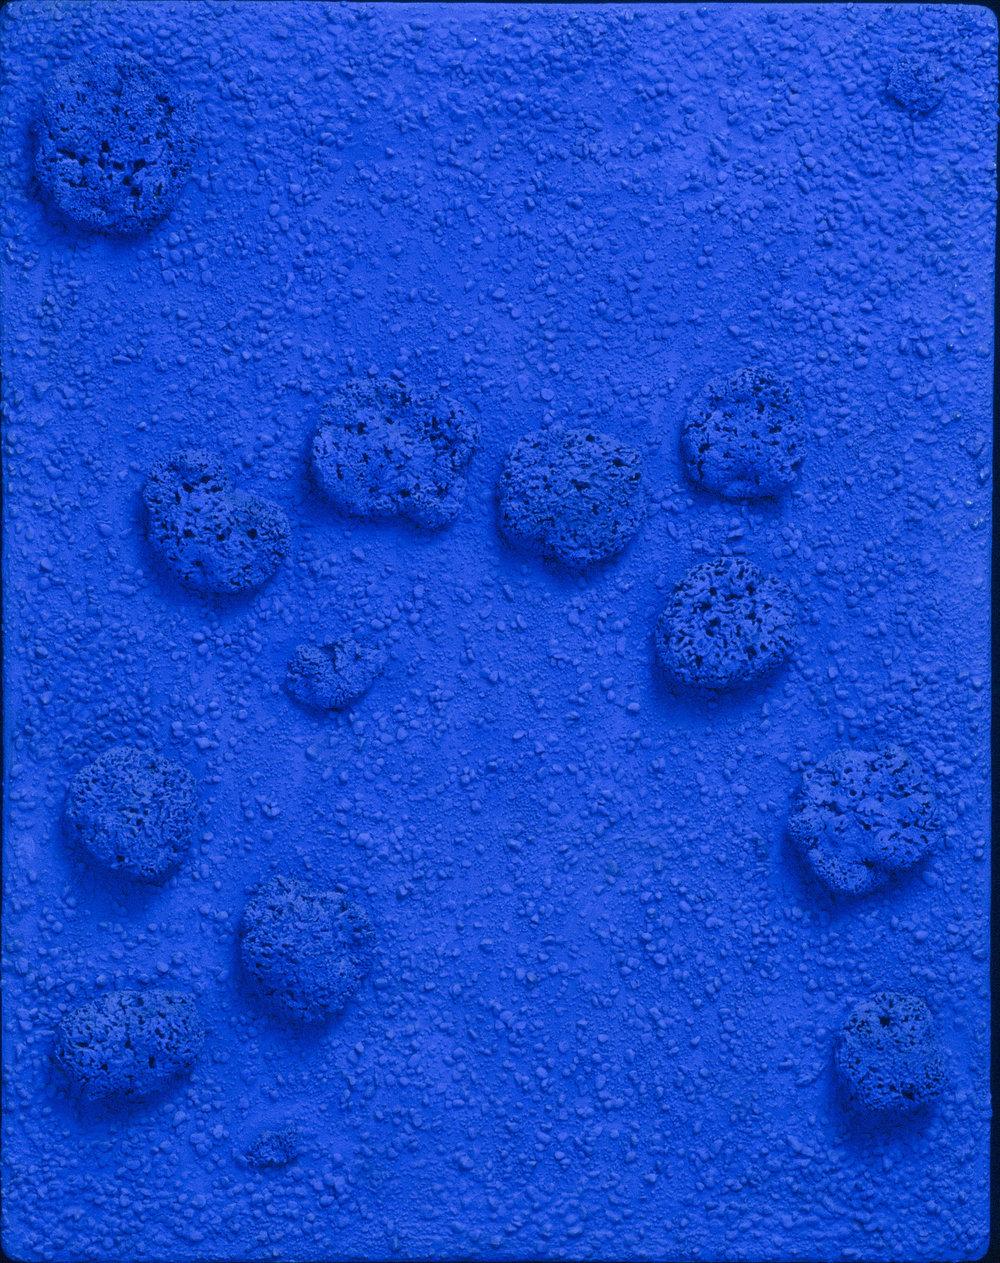 Blue Monochrome Sponge Relief (RE24), 1960